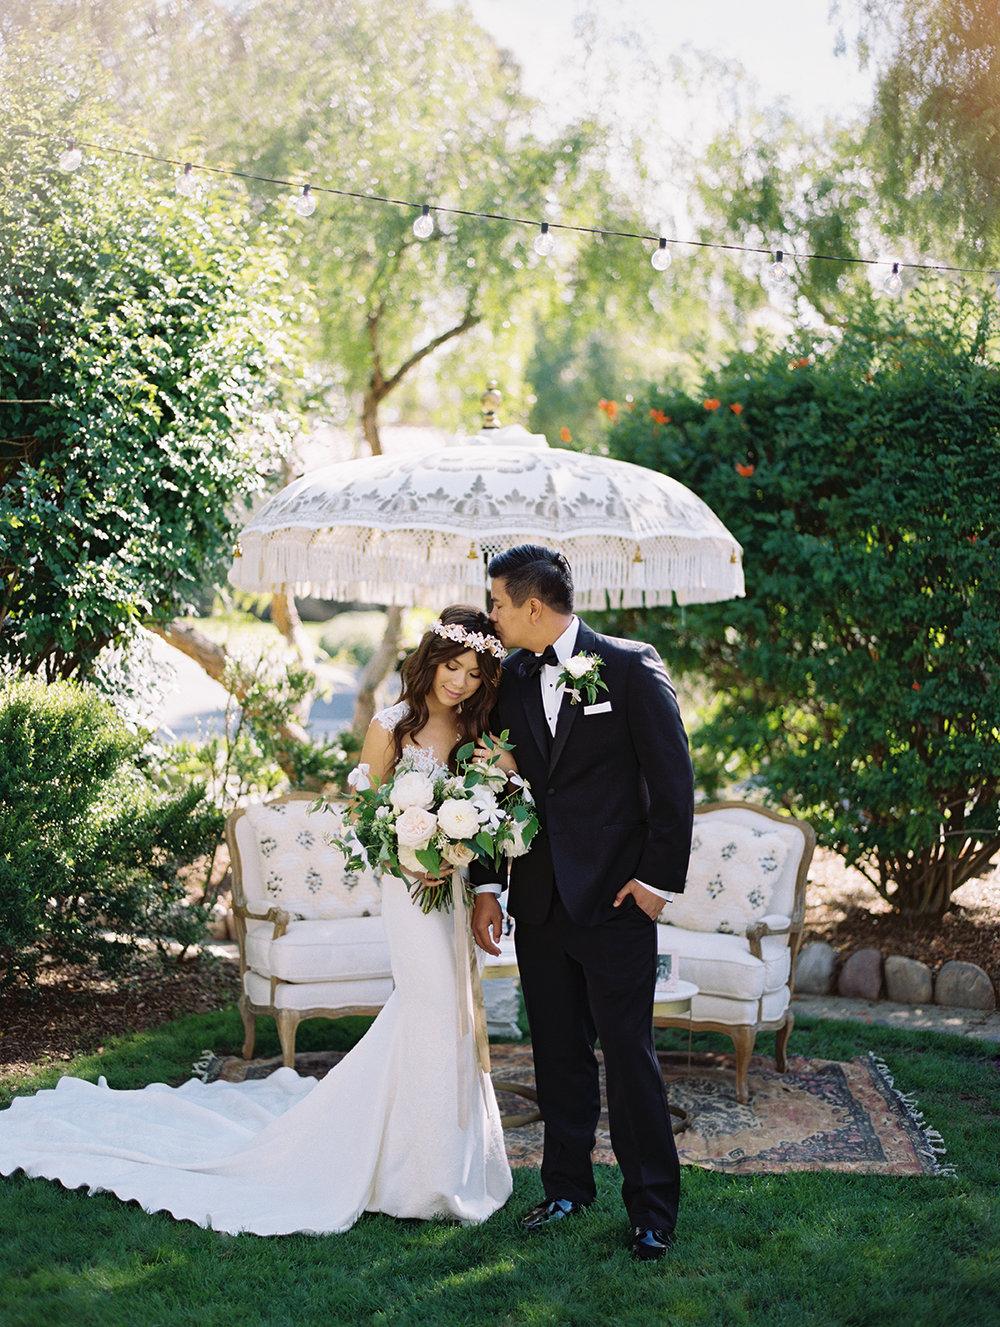 252-phillip-uyen-la-jolla-wedding-fine-art-film-brumley-wells-photography.jpg